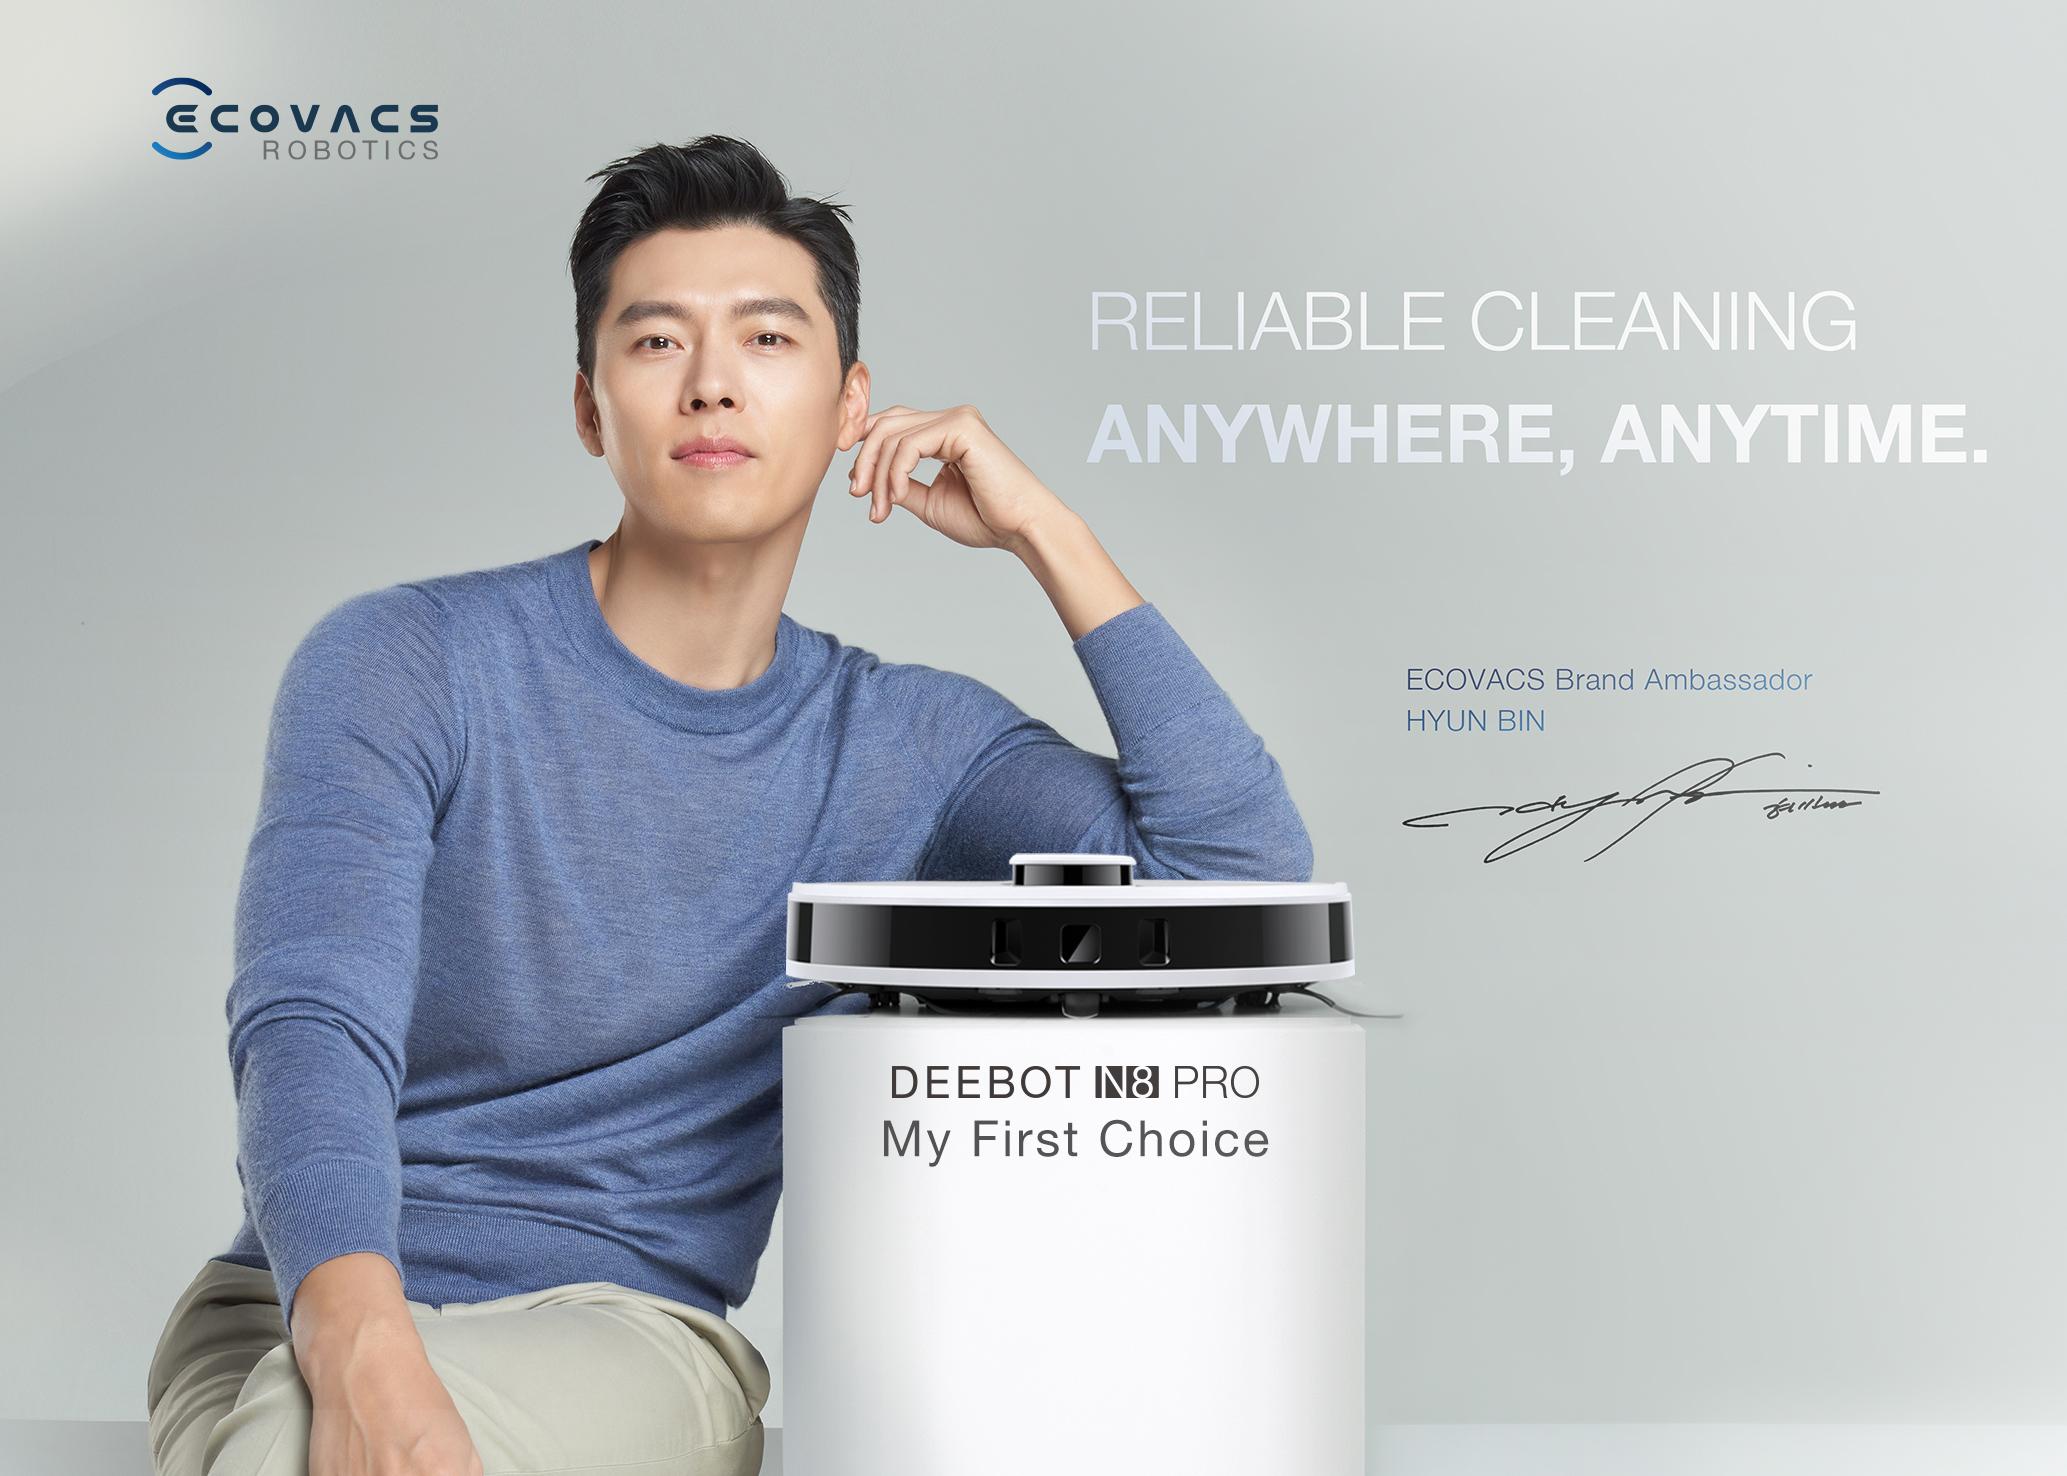 ECOVACS ROBOTICS Appoints Popular Korean Actor Hyun Bin as Brand Ambassador Adding Excitement To Indonesia Market